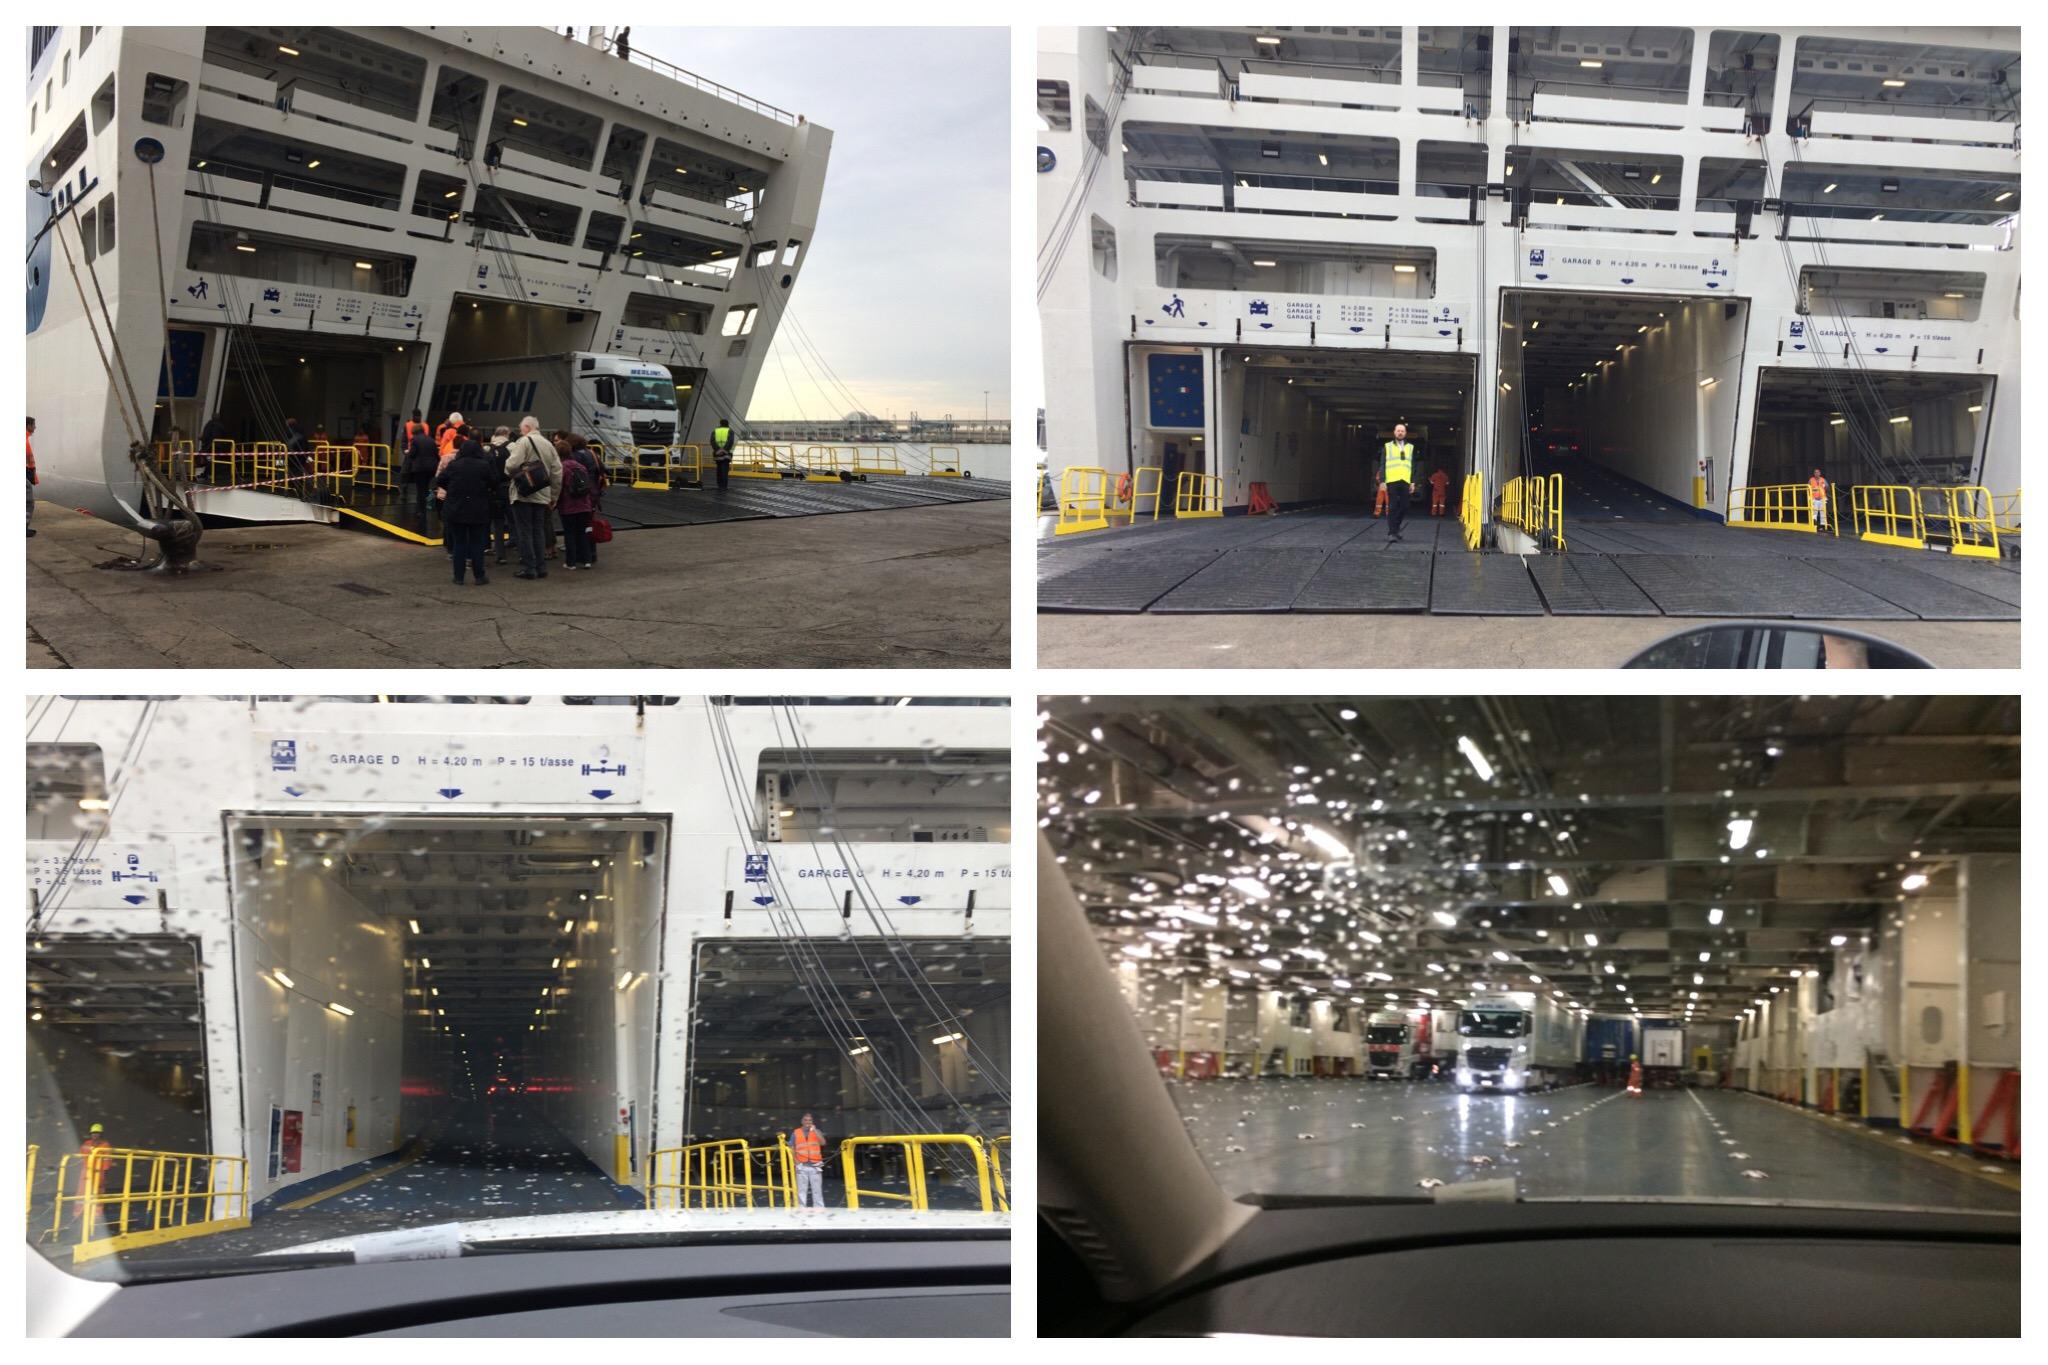 GNV ferry Barcelona to Genoa boarding